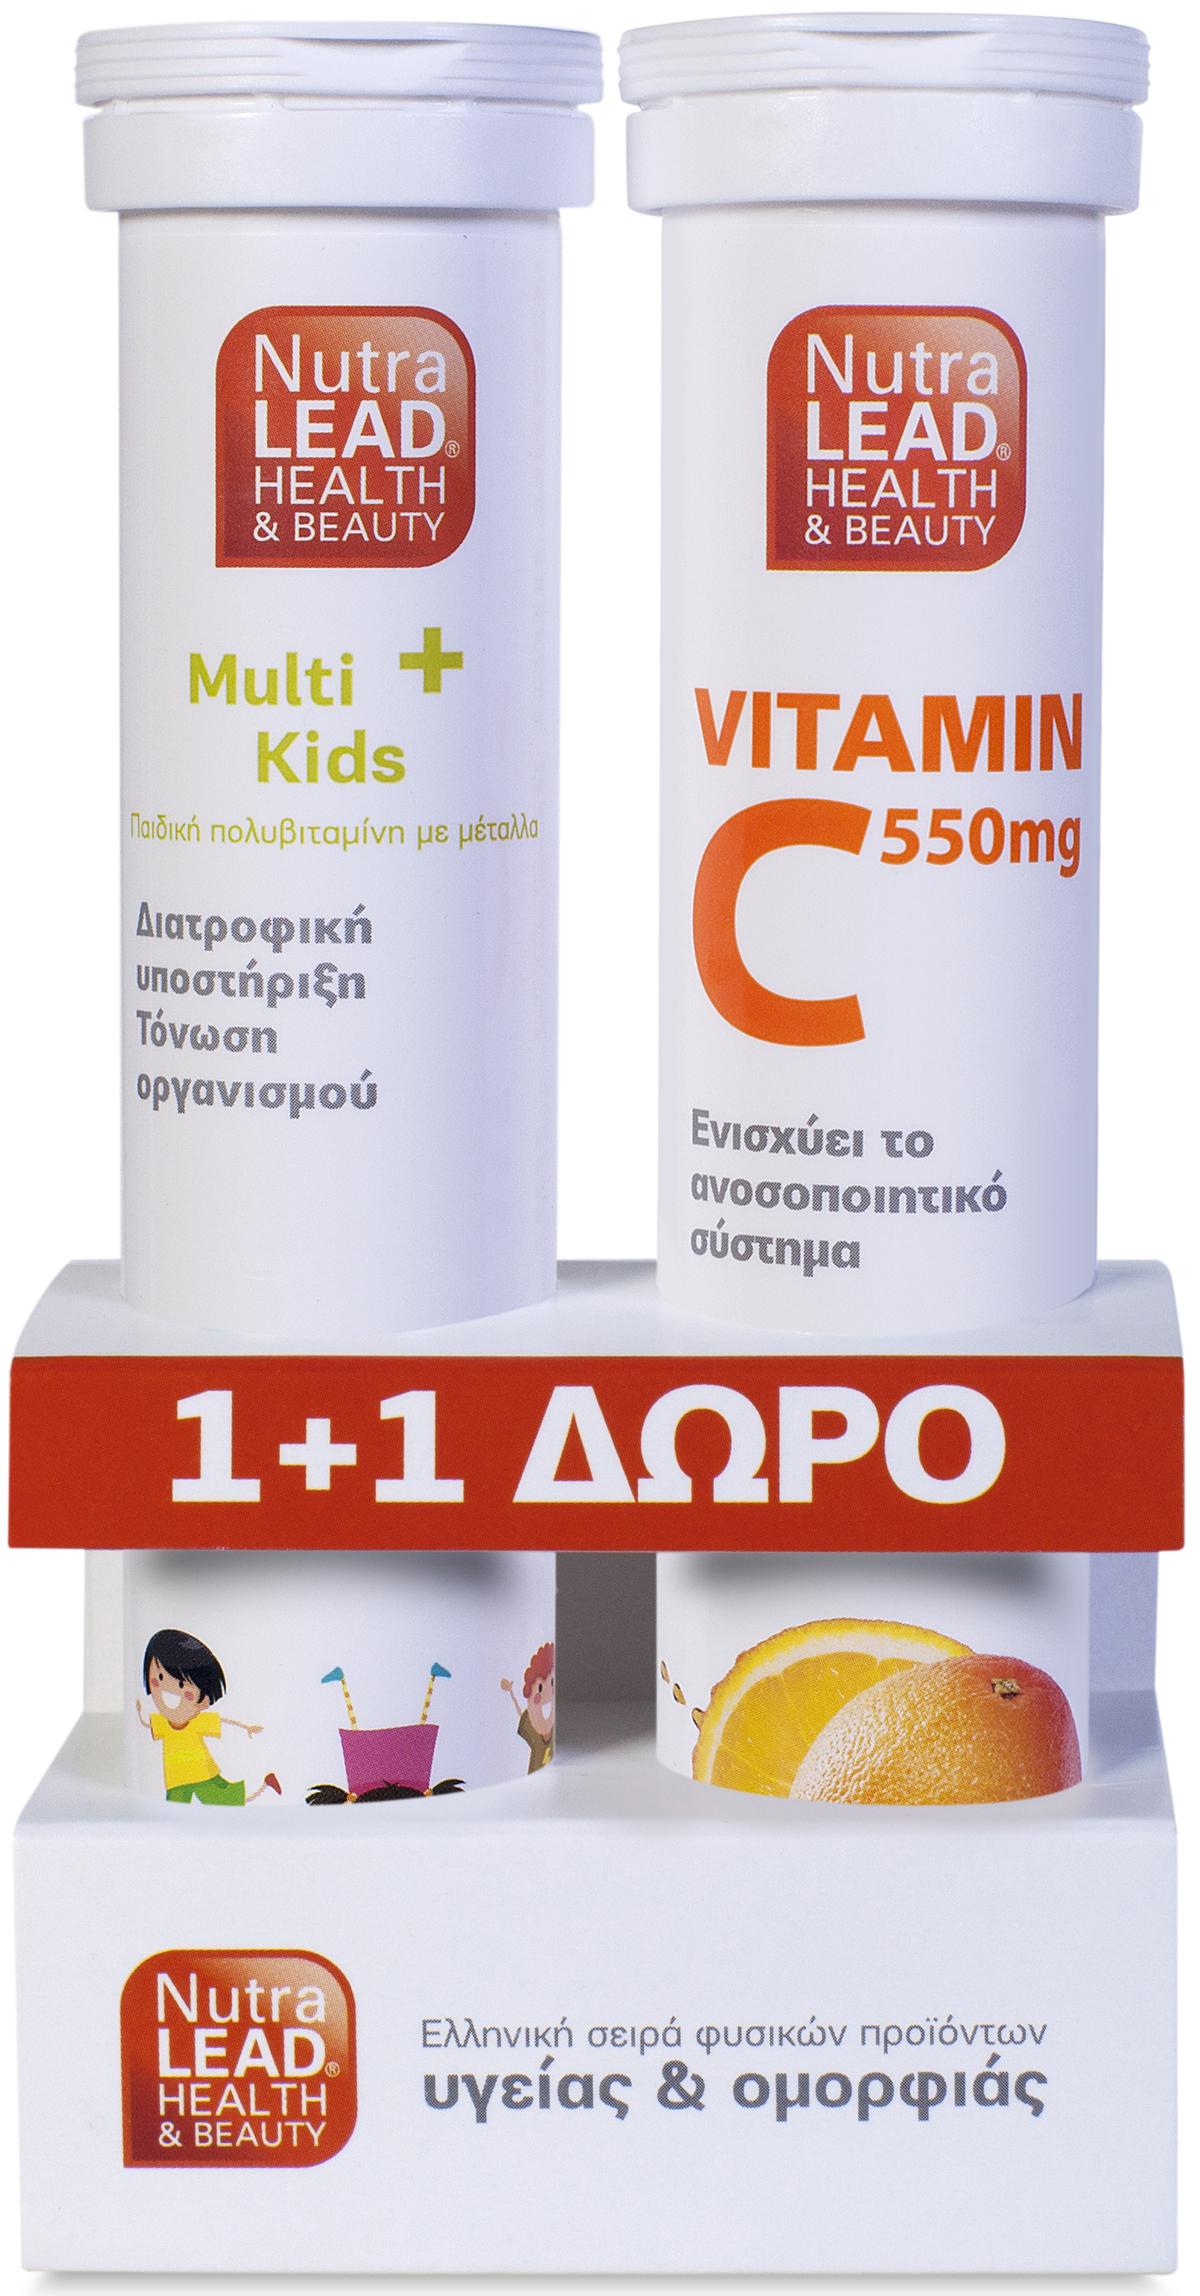 Nutralead Πακέτο Προσφοράς Multi+ Kids Βιταμίνες & Μέταλλα 20Αναβρ.Δισκία + Βιταμίνη C 550mg – Πορτοκάλι 20Αν.Δισκία